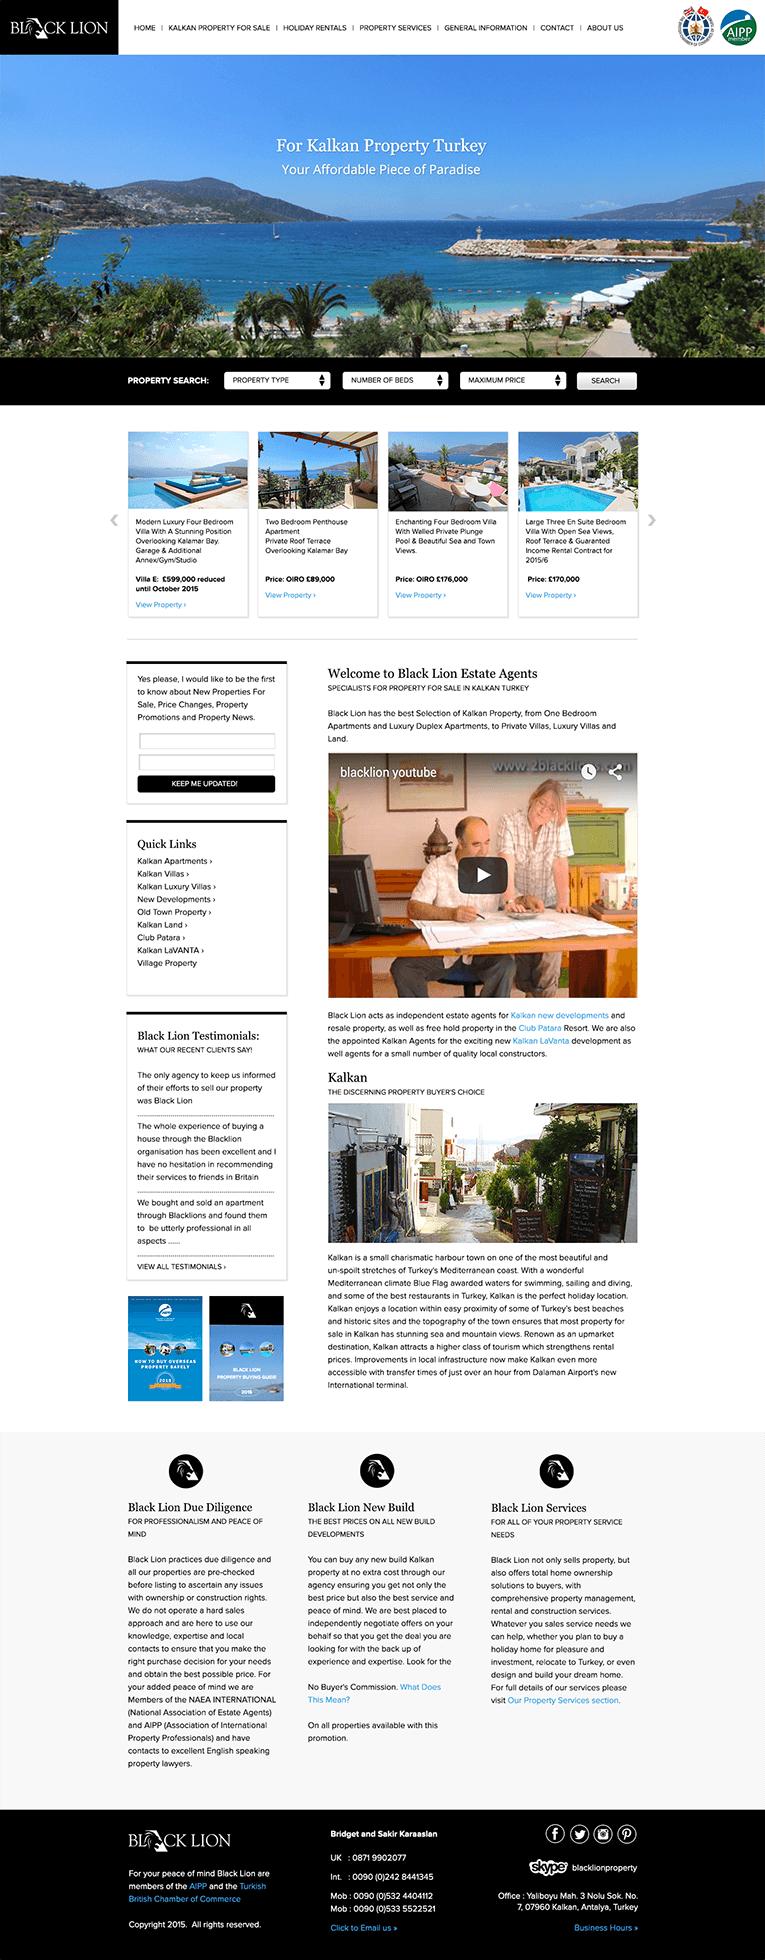 Home page design for Black Lion